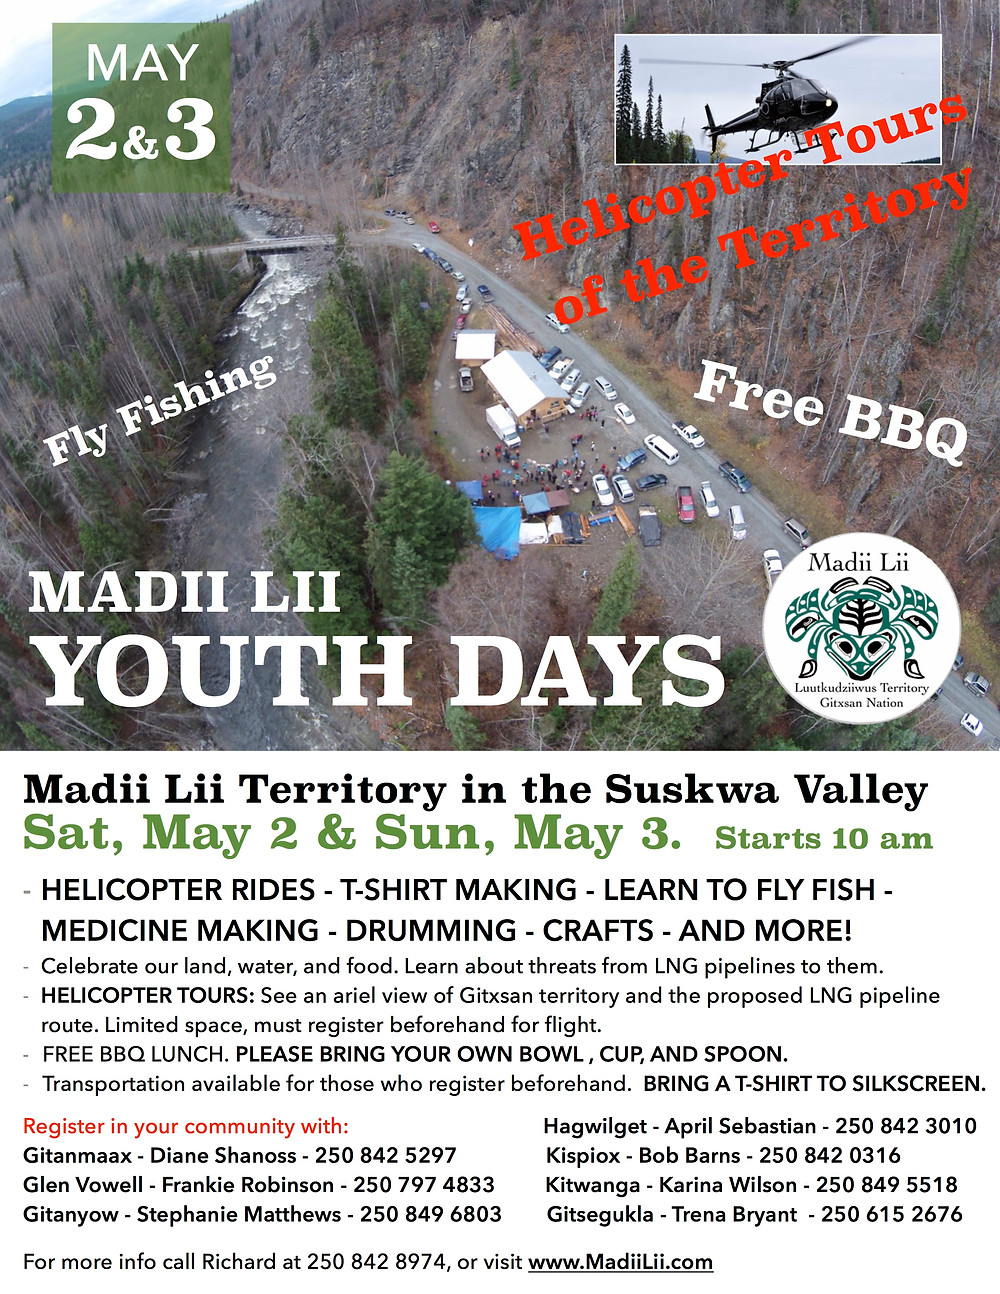 MadiiLii_YouthDays_Poster.jpg